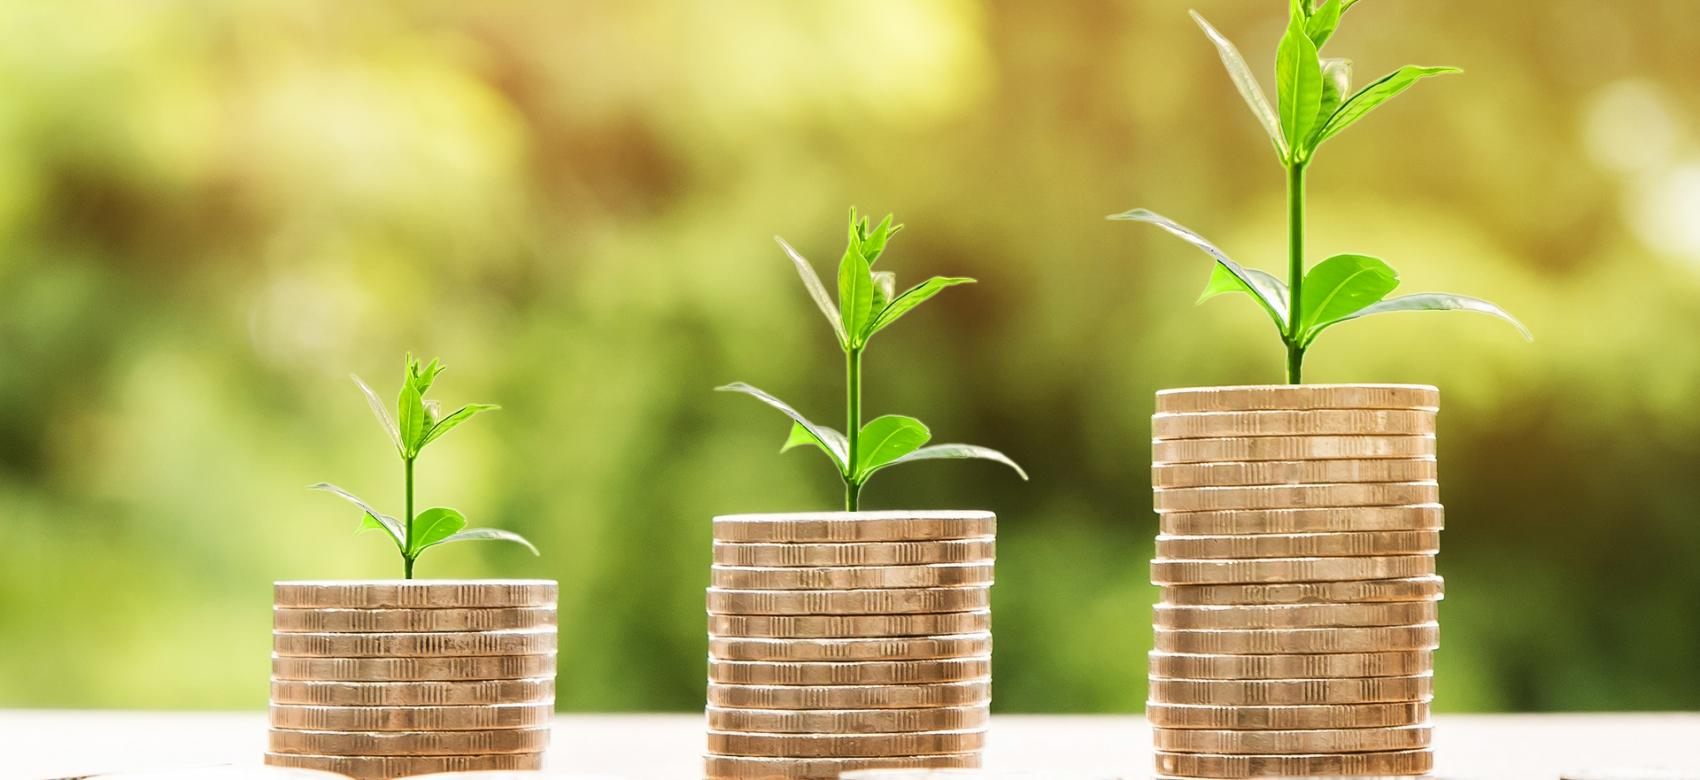 Monedas apiladas con brotes de plantas